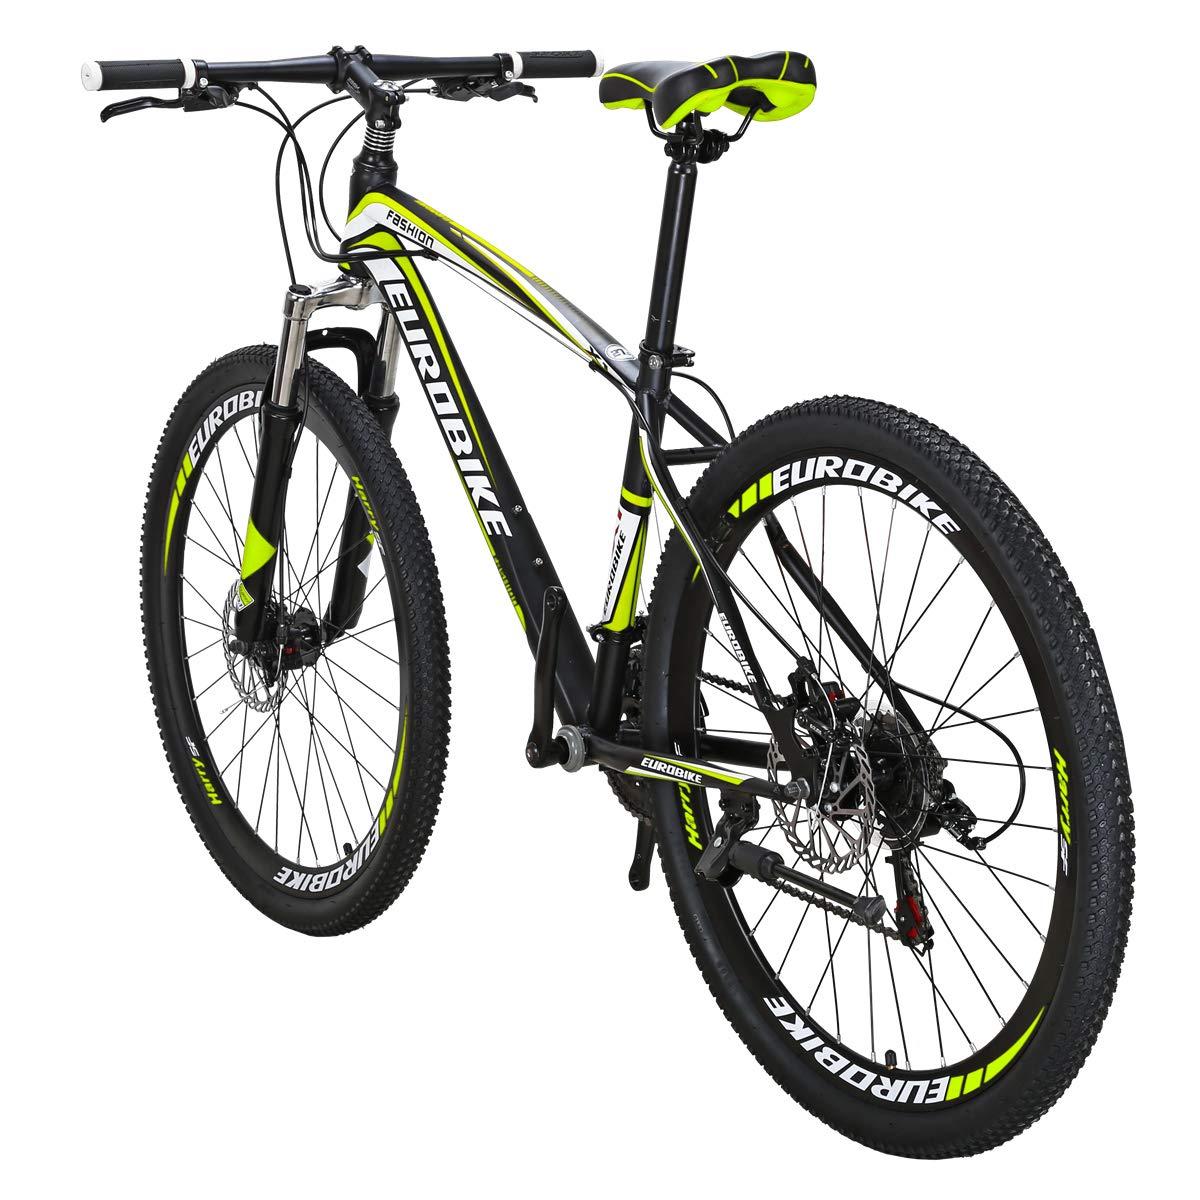 c2f1d1559a5 Eurobike X1 Mountain Bike 21 Speed MTB Bicycle 26 Inch Wheels Dual Disc  Brake Suspension Fork MTB Bicycle Black-Yellow, Hardtail Mountain Bikes -  Amazon ...